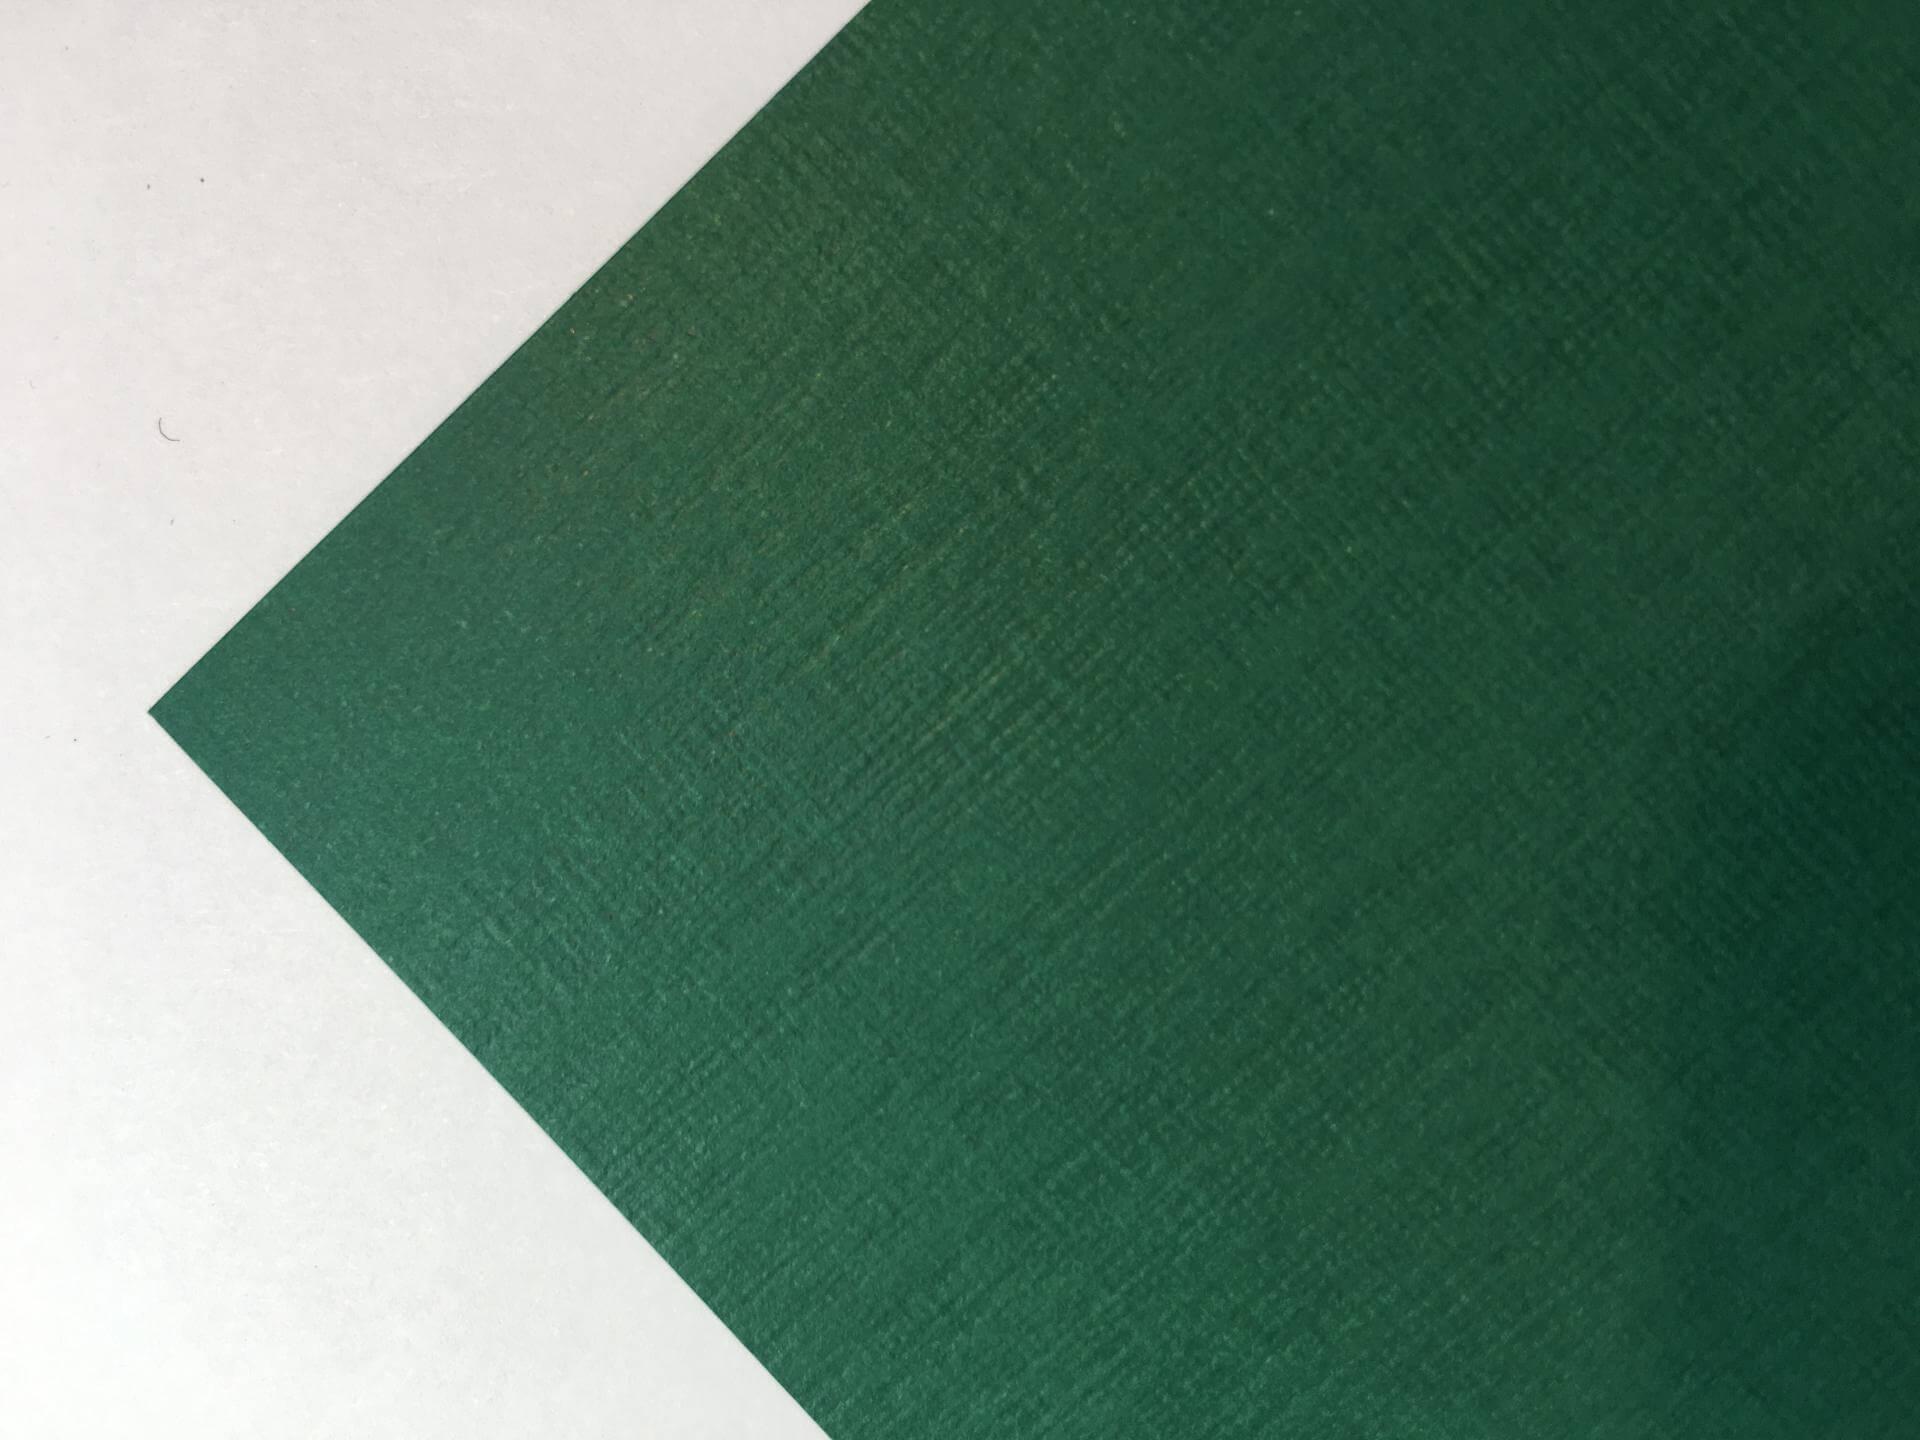 Sirio tela foglia